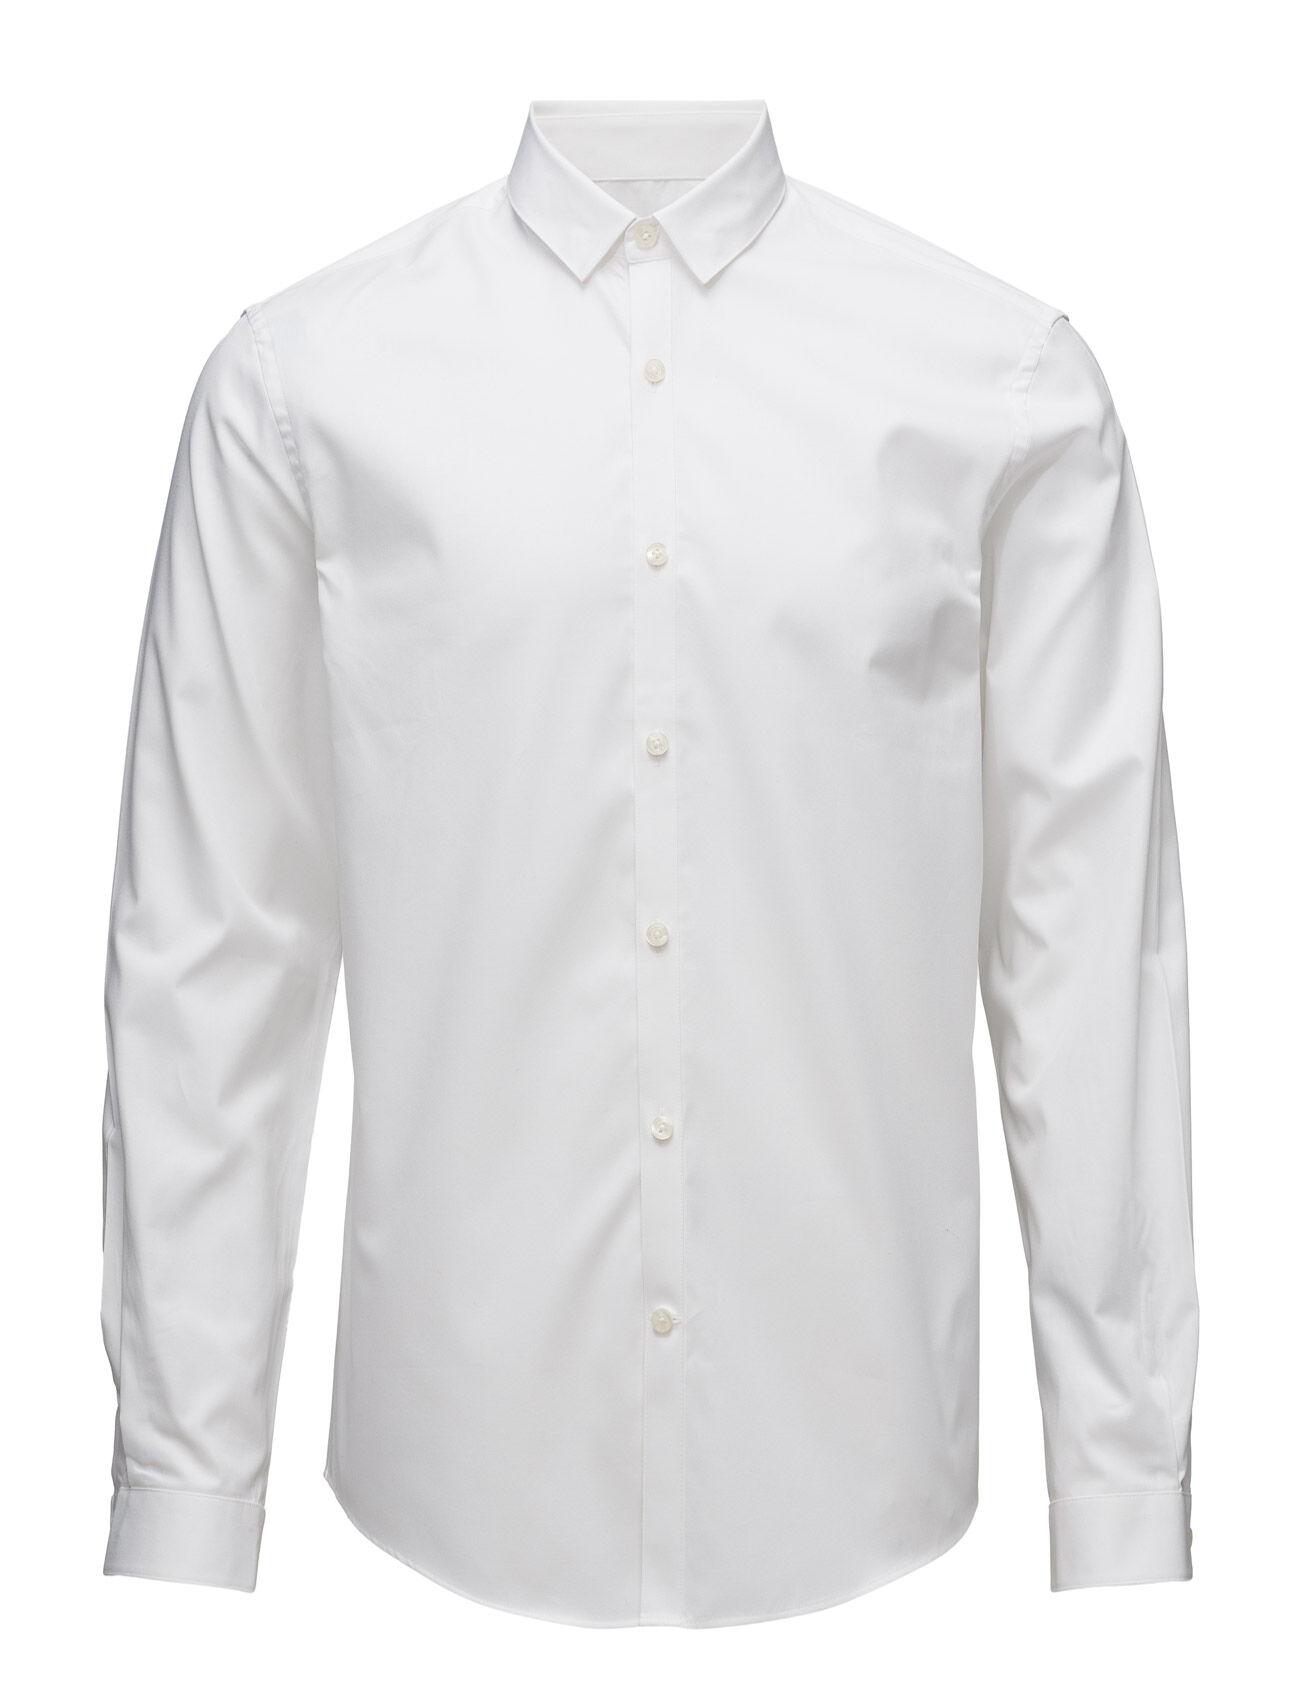 Lindbergh Plain Twill Stretch Shirtl/S